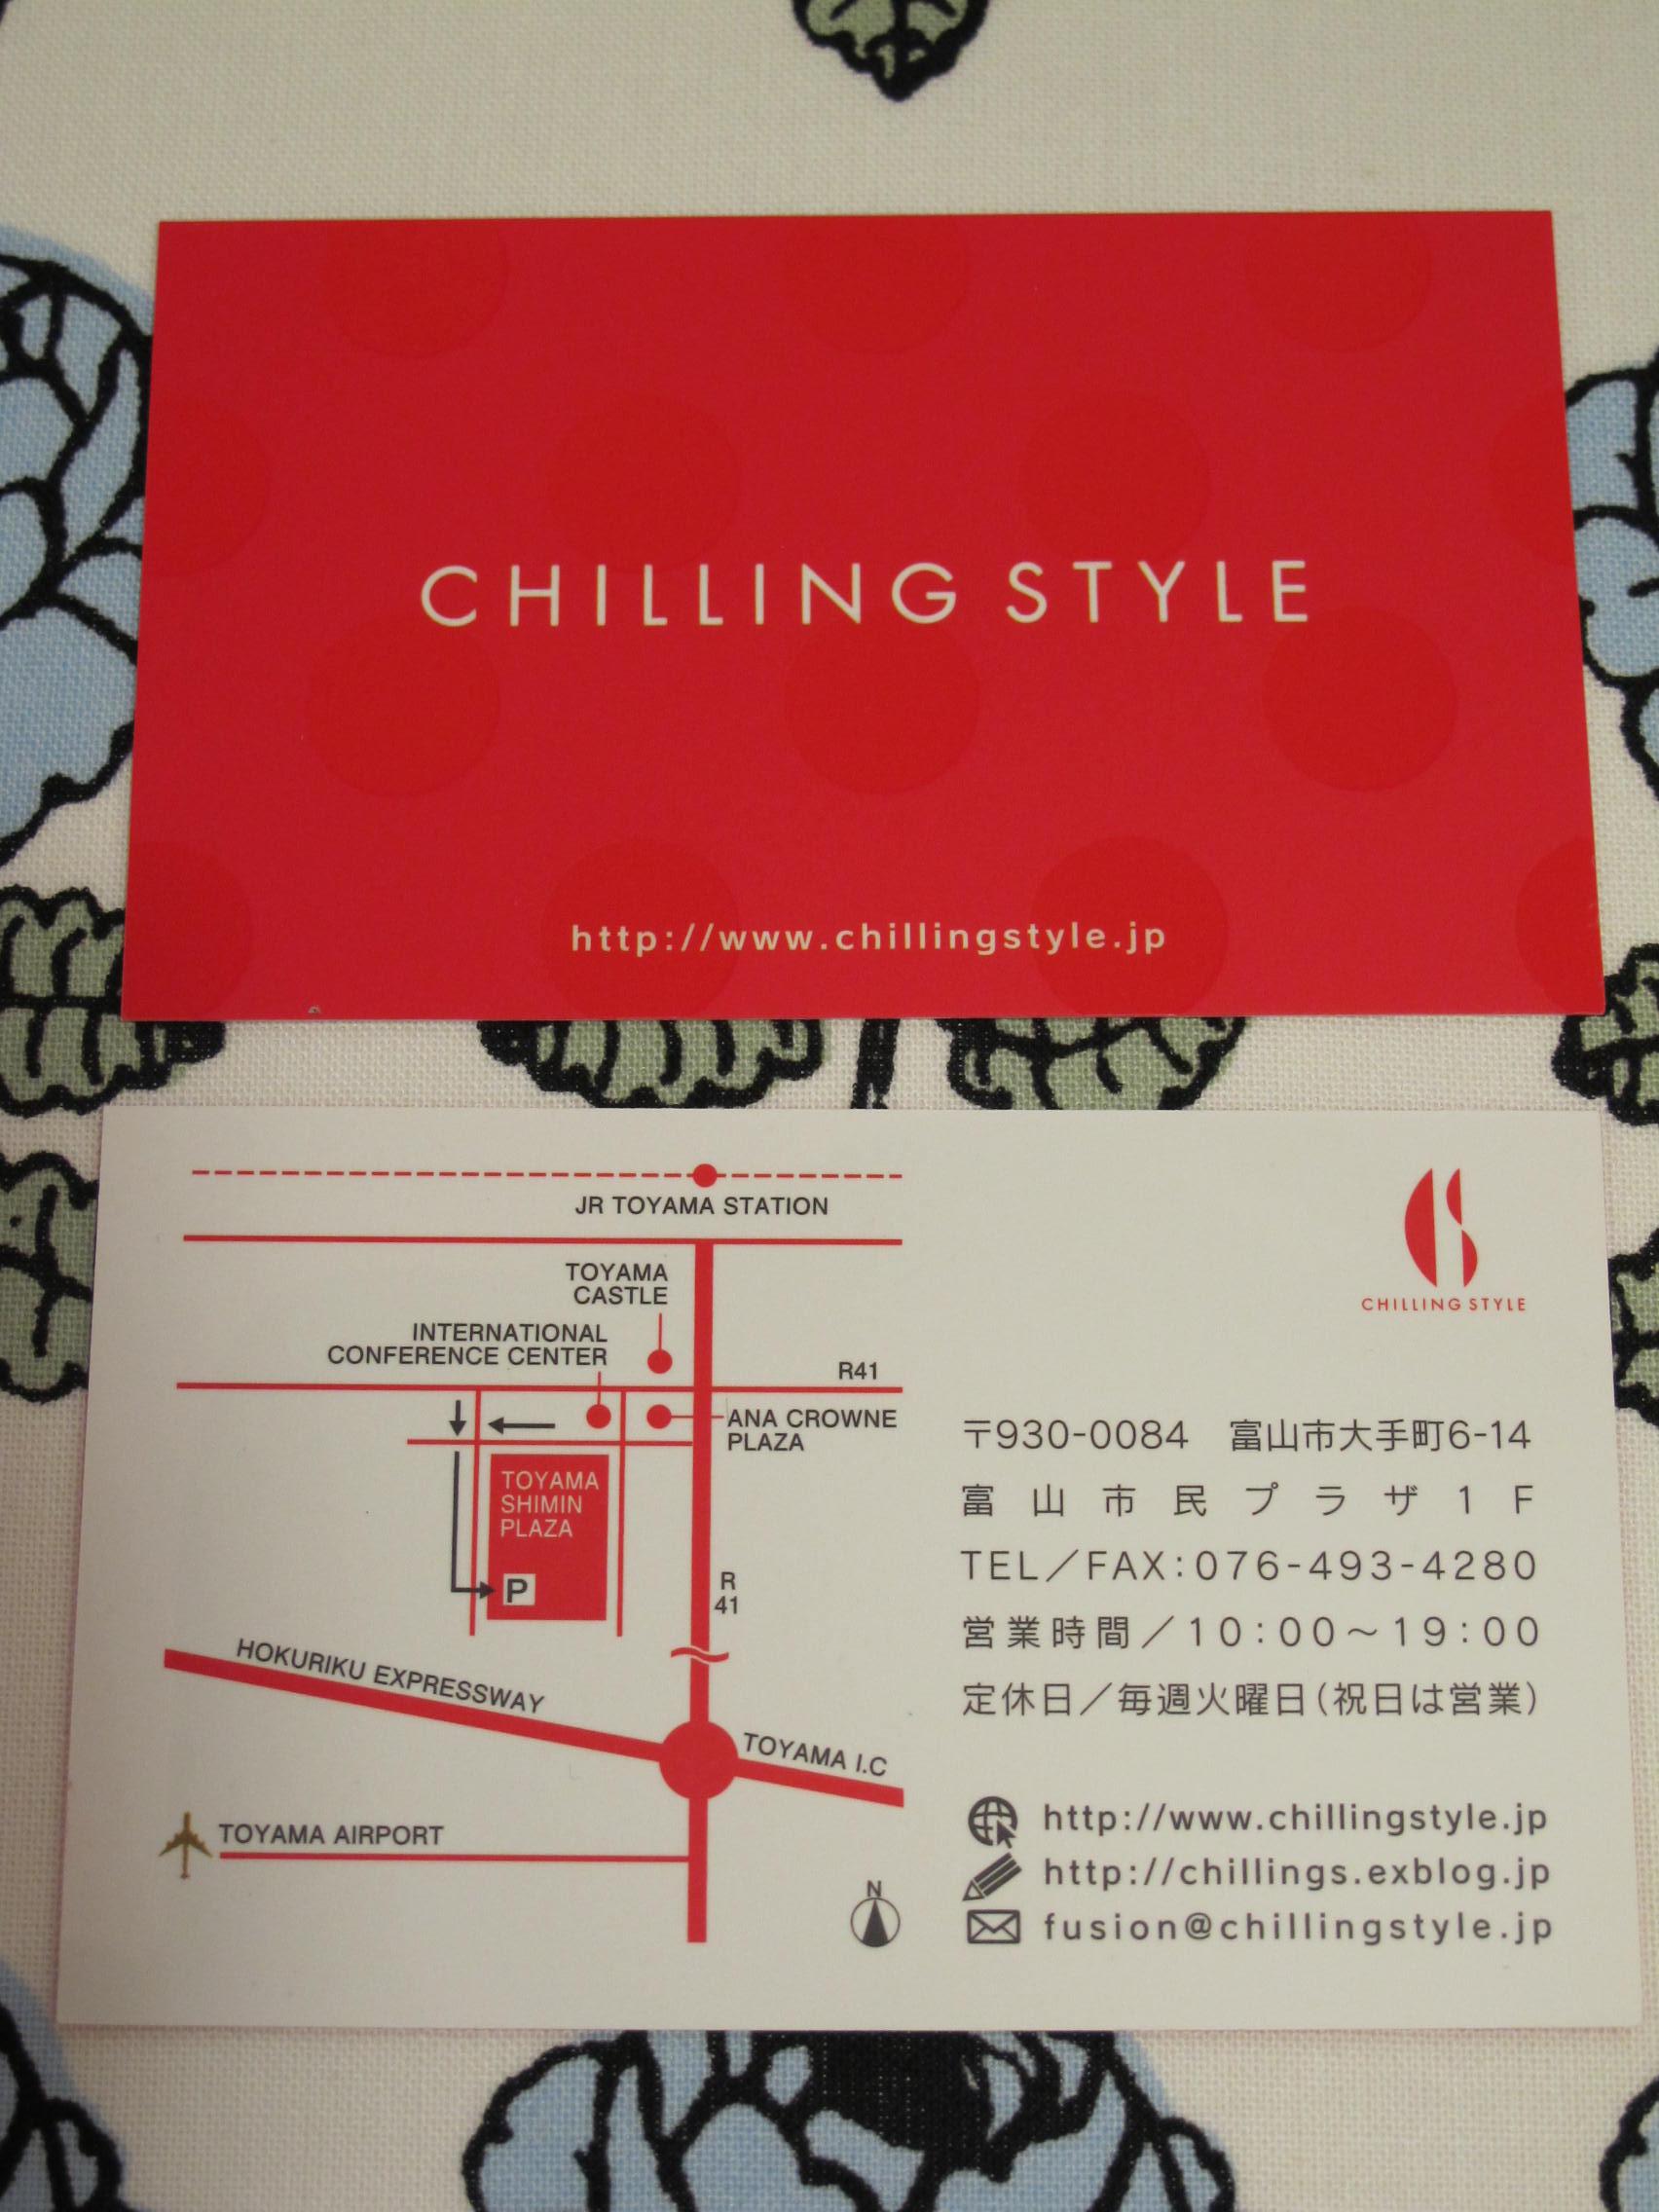 CHILLING STYLE基本情報_d0182409_16573192.jpg